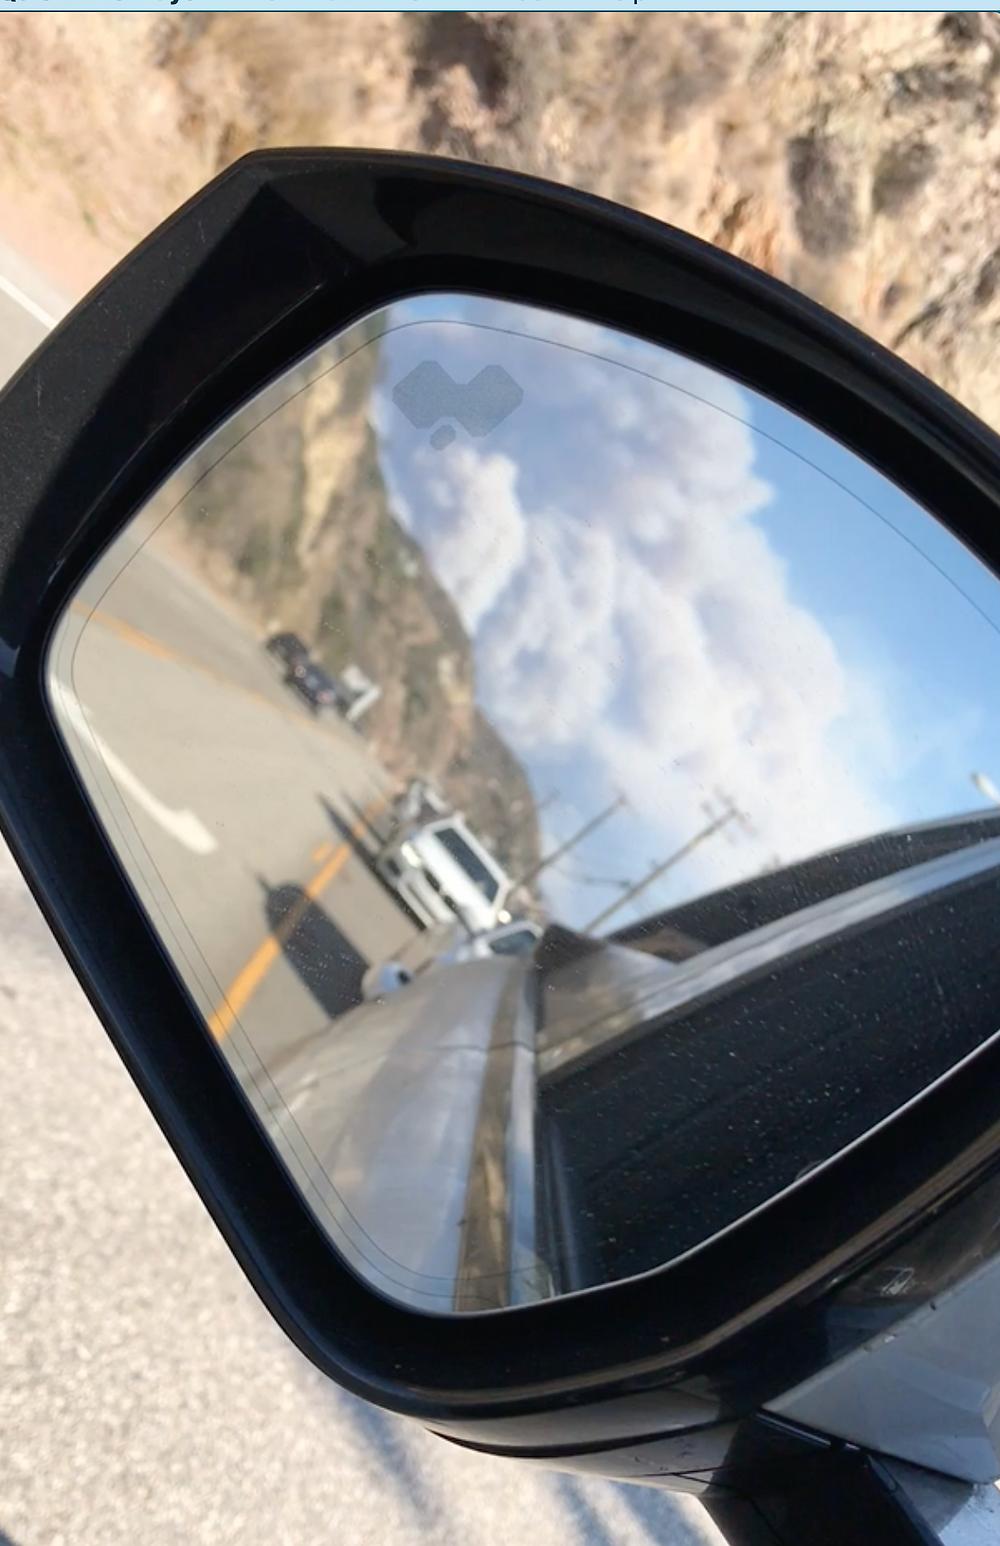 Woosley Fire cloud of smoke evacuating Malibu